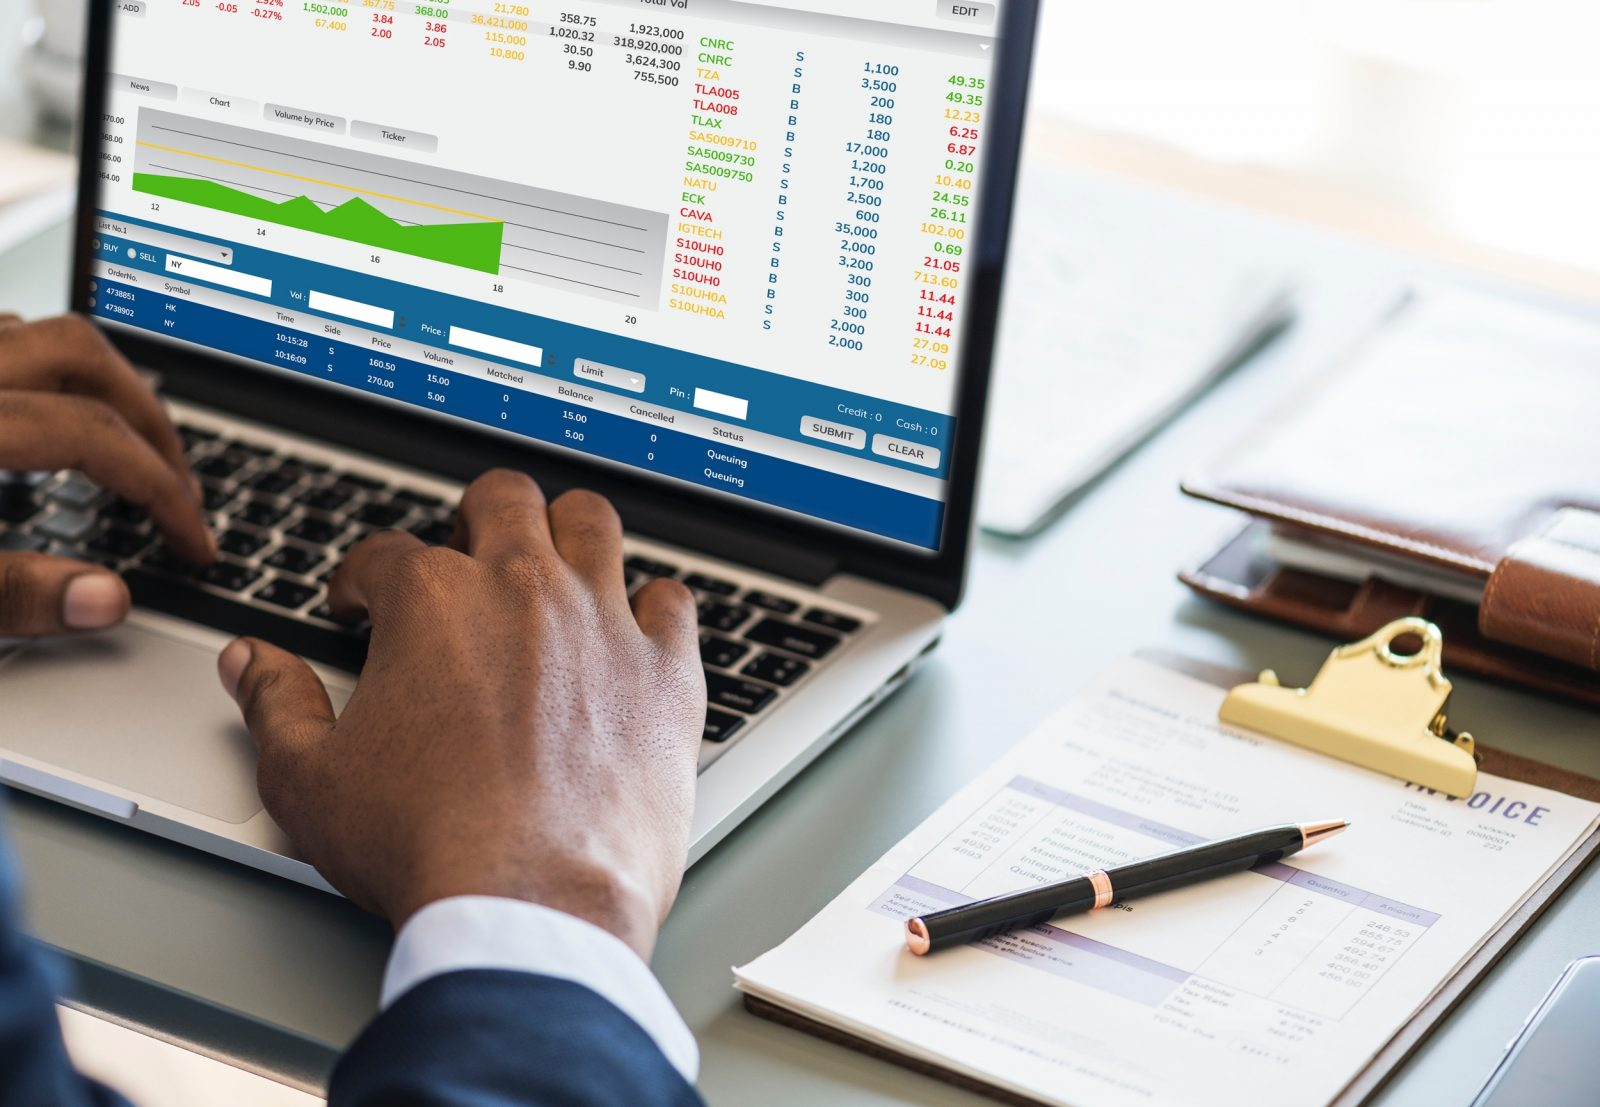 Manfaat Evaluasi Kinerja Keuangan Perusahaan Bagi  …